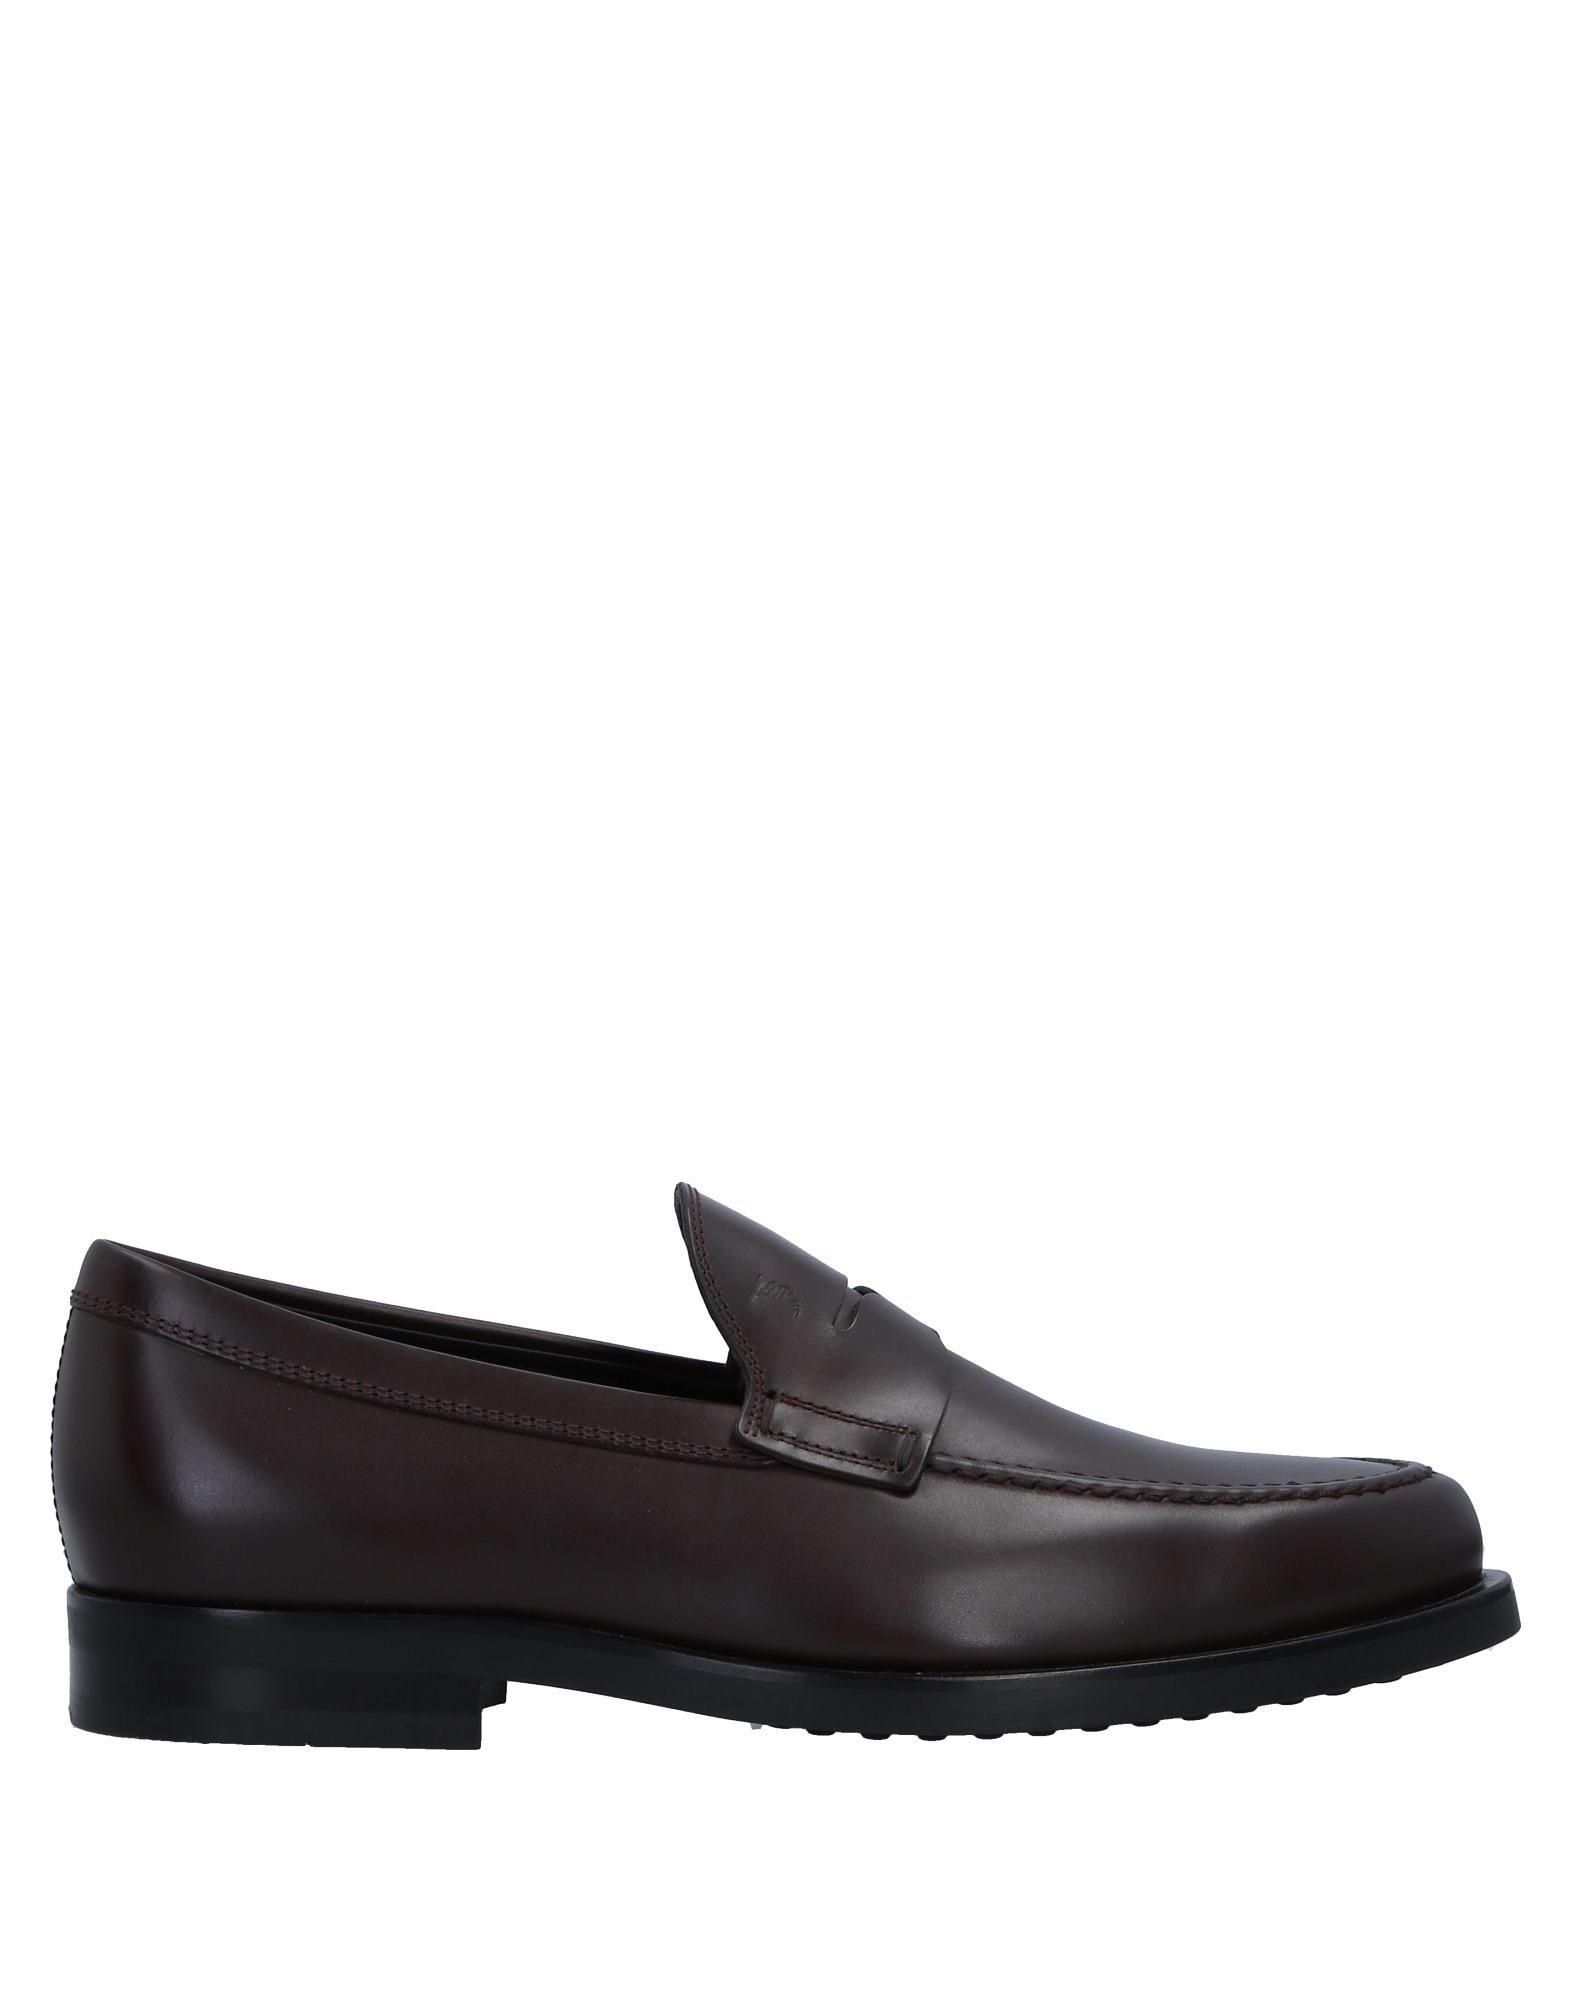 Tod's Mokassins Herren  11541123CR Gute Qualität beliebte Schuhe